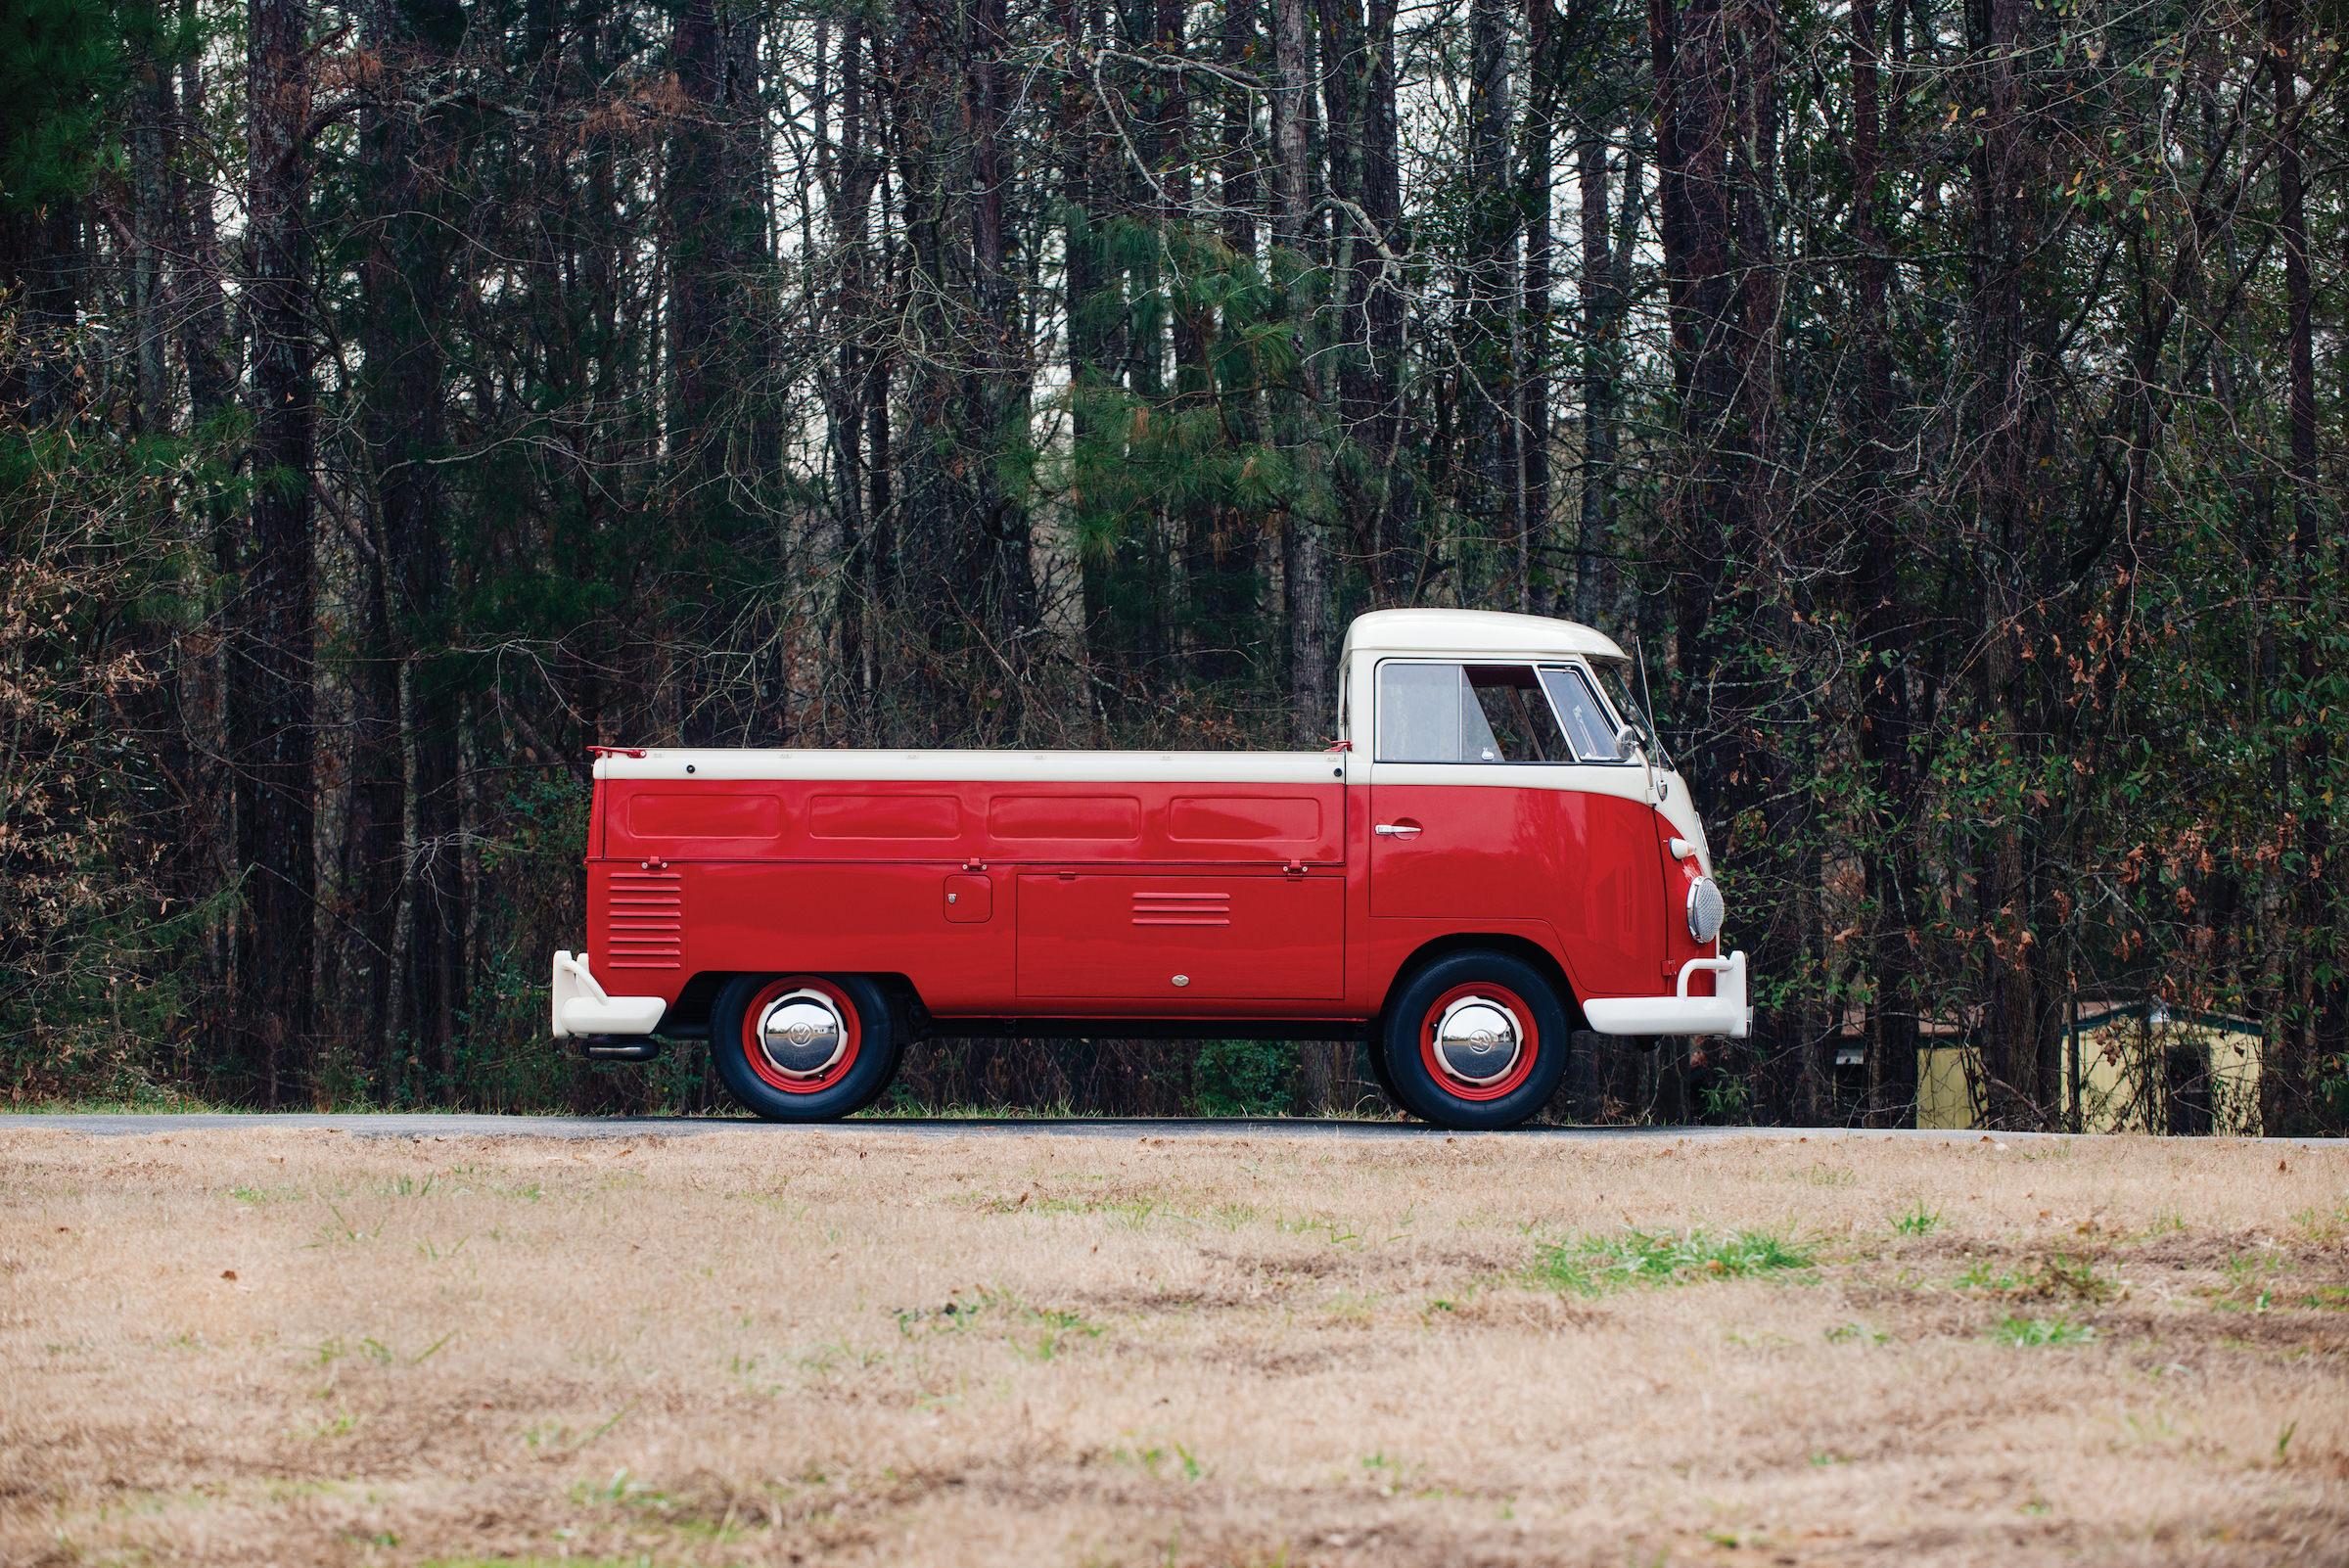 design icon 1961 volkswagen type 2 single cab pickup. Black Bedroom Furniture Sets. Home Design Ideas